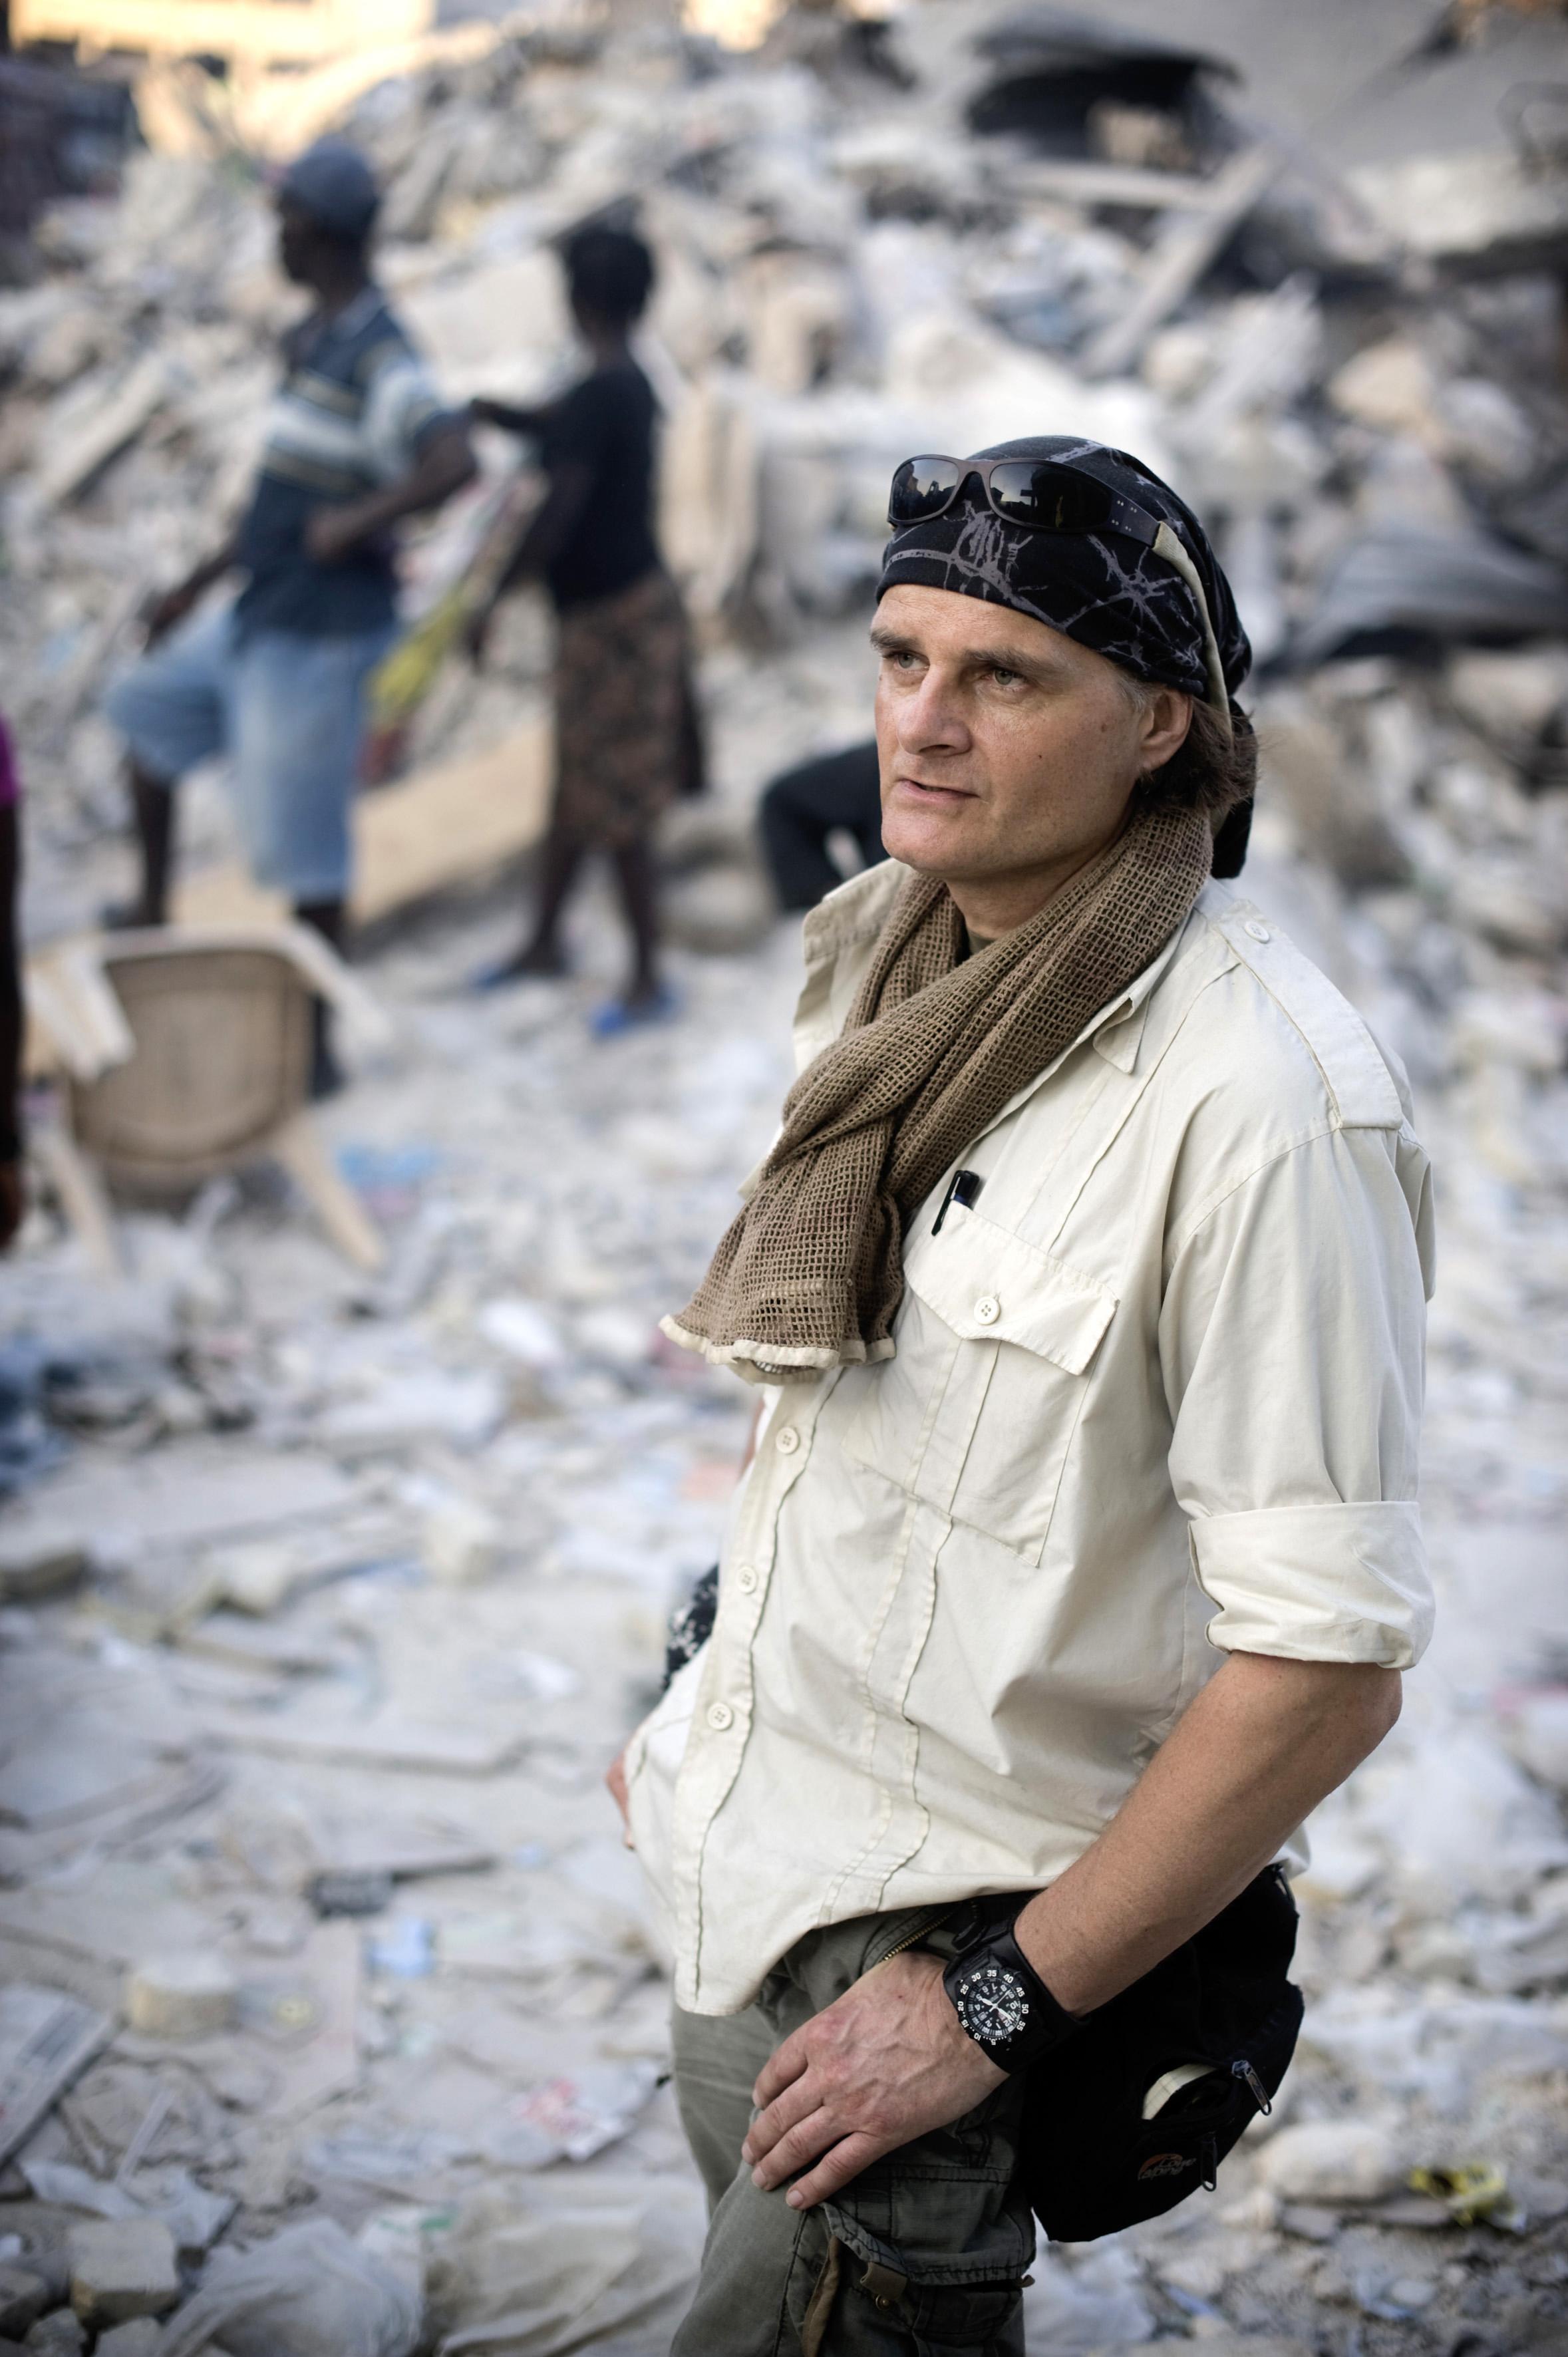 Krigsfotograf Harald Henden - I krig og ensomhet